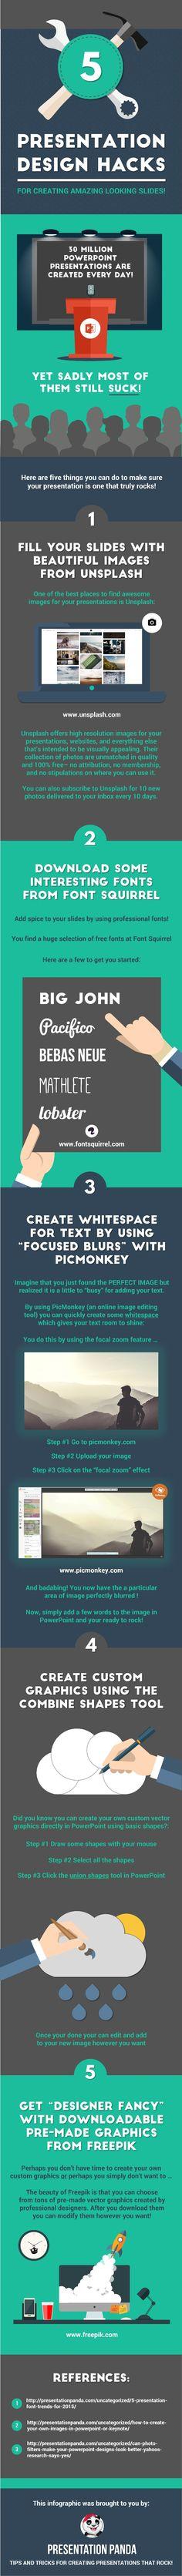 5 Presentation Design Tips For Creating Amazing Looking Slides